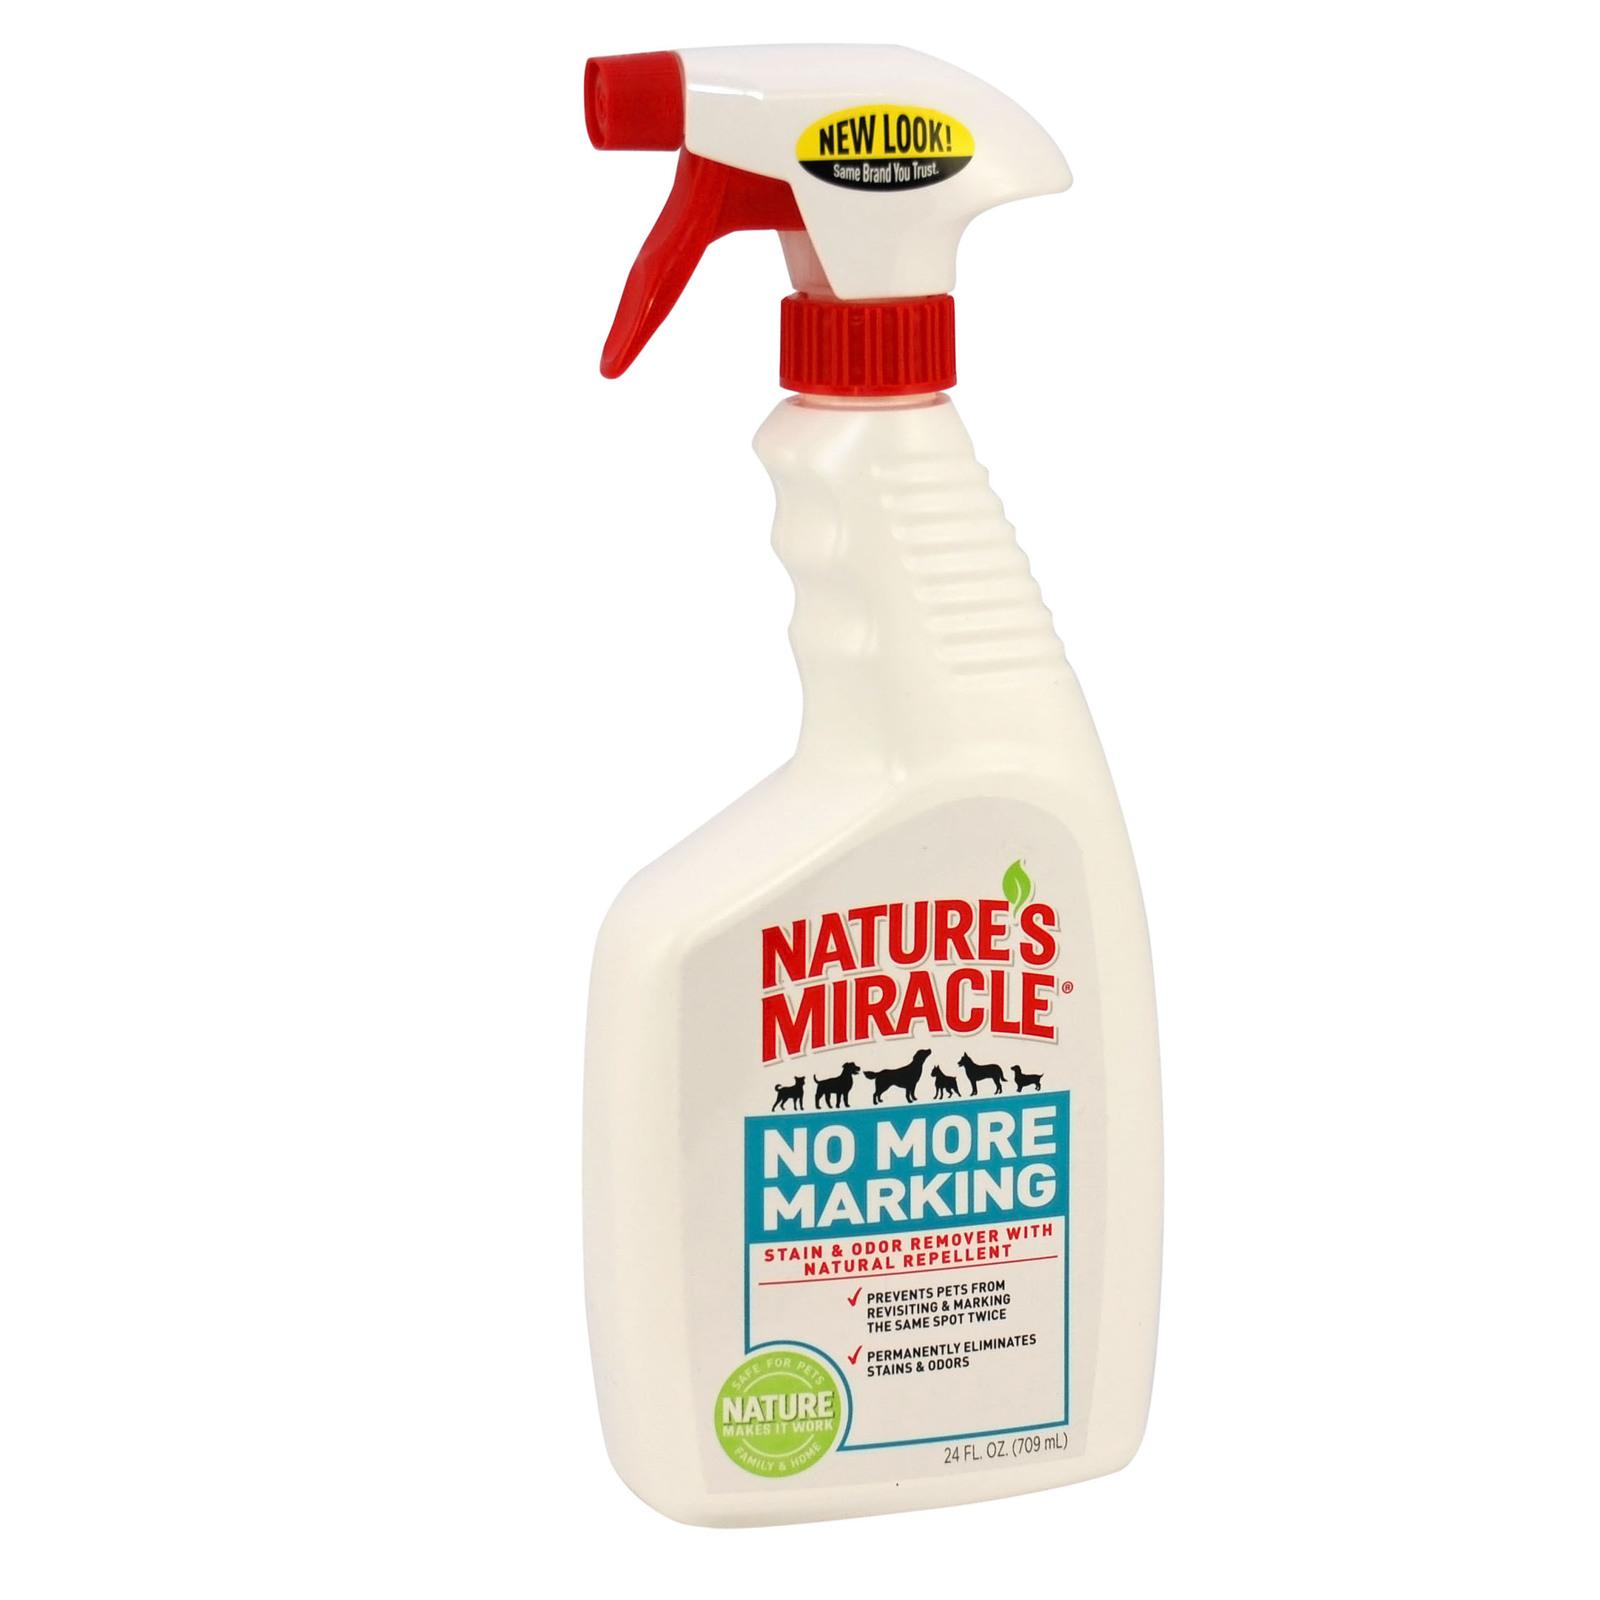 Nature's Miracle: No More Marking image